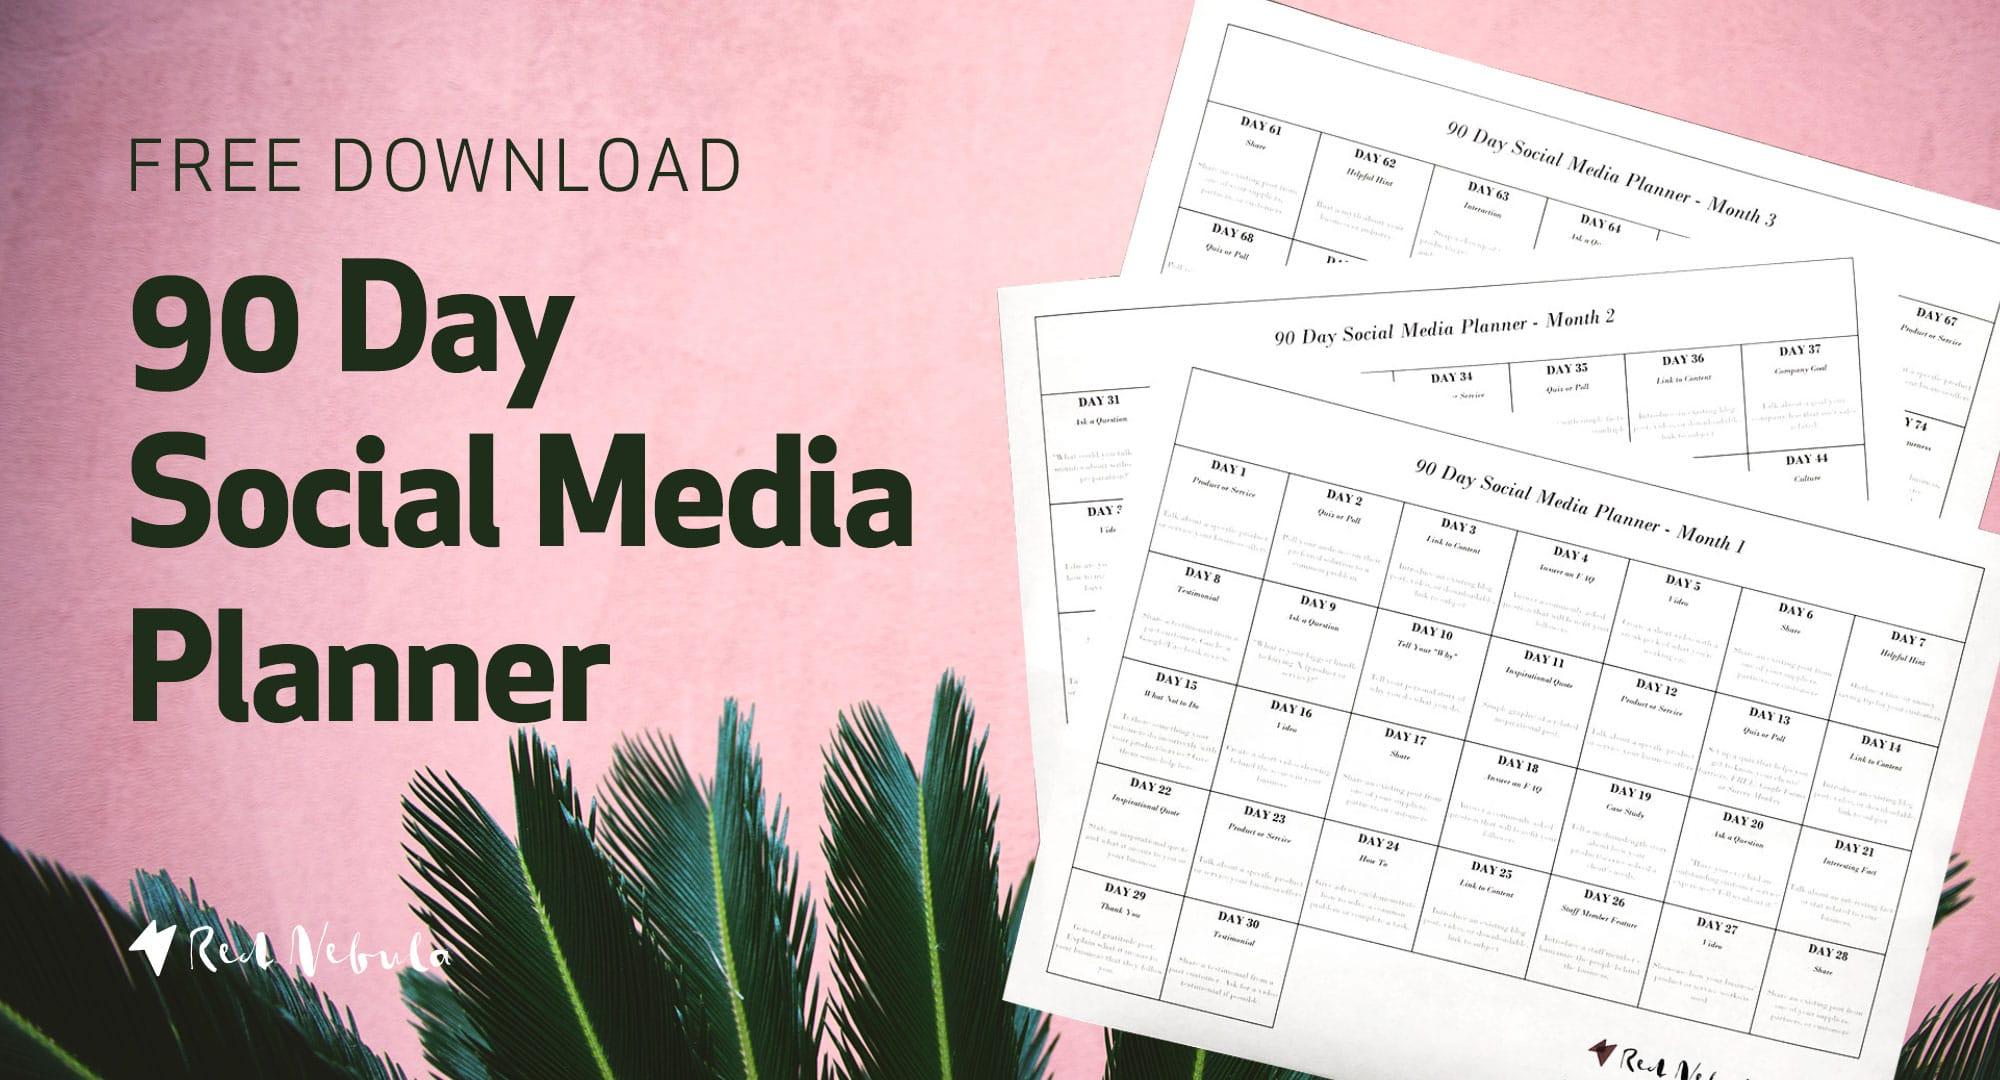 90-day-social-media-planner-graphic-summer